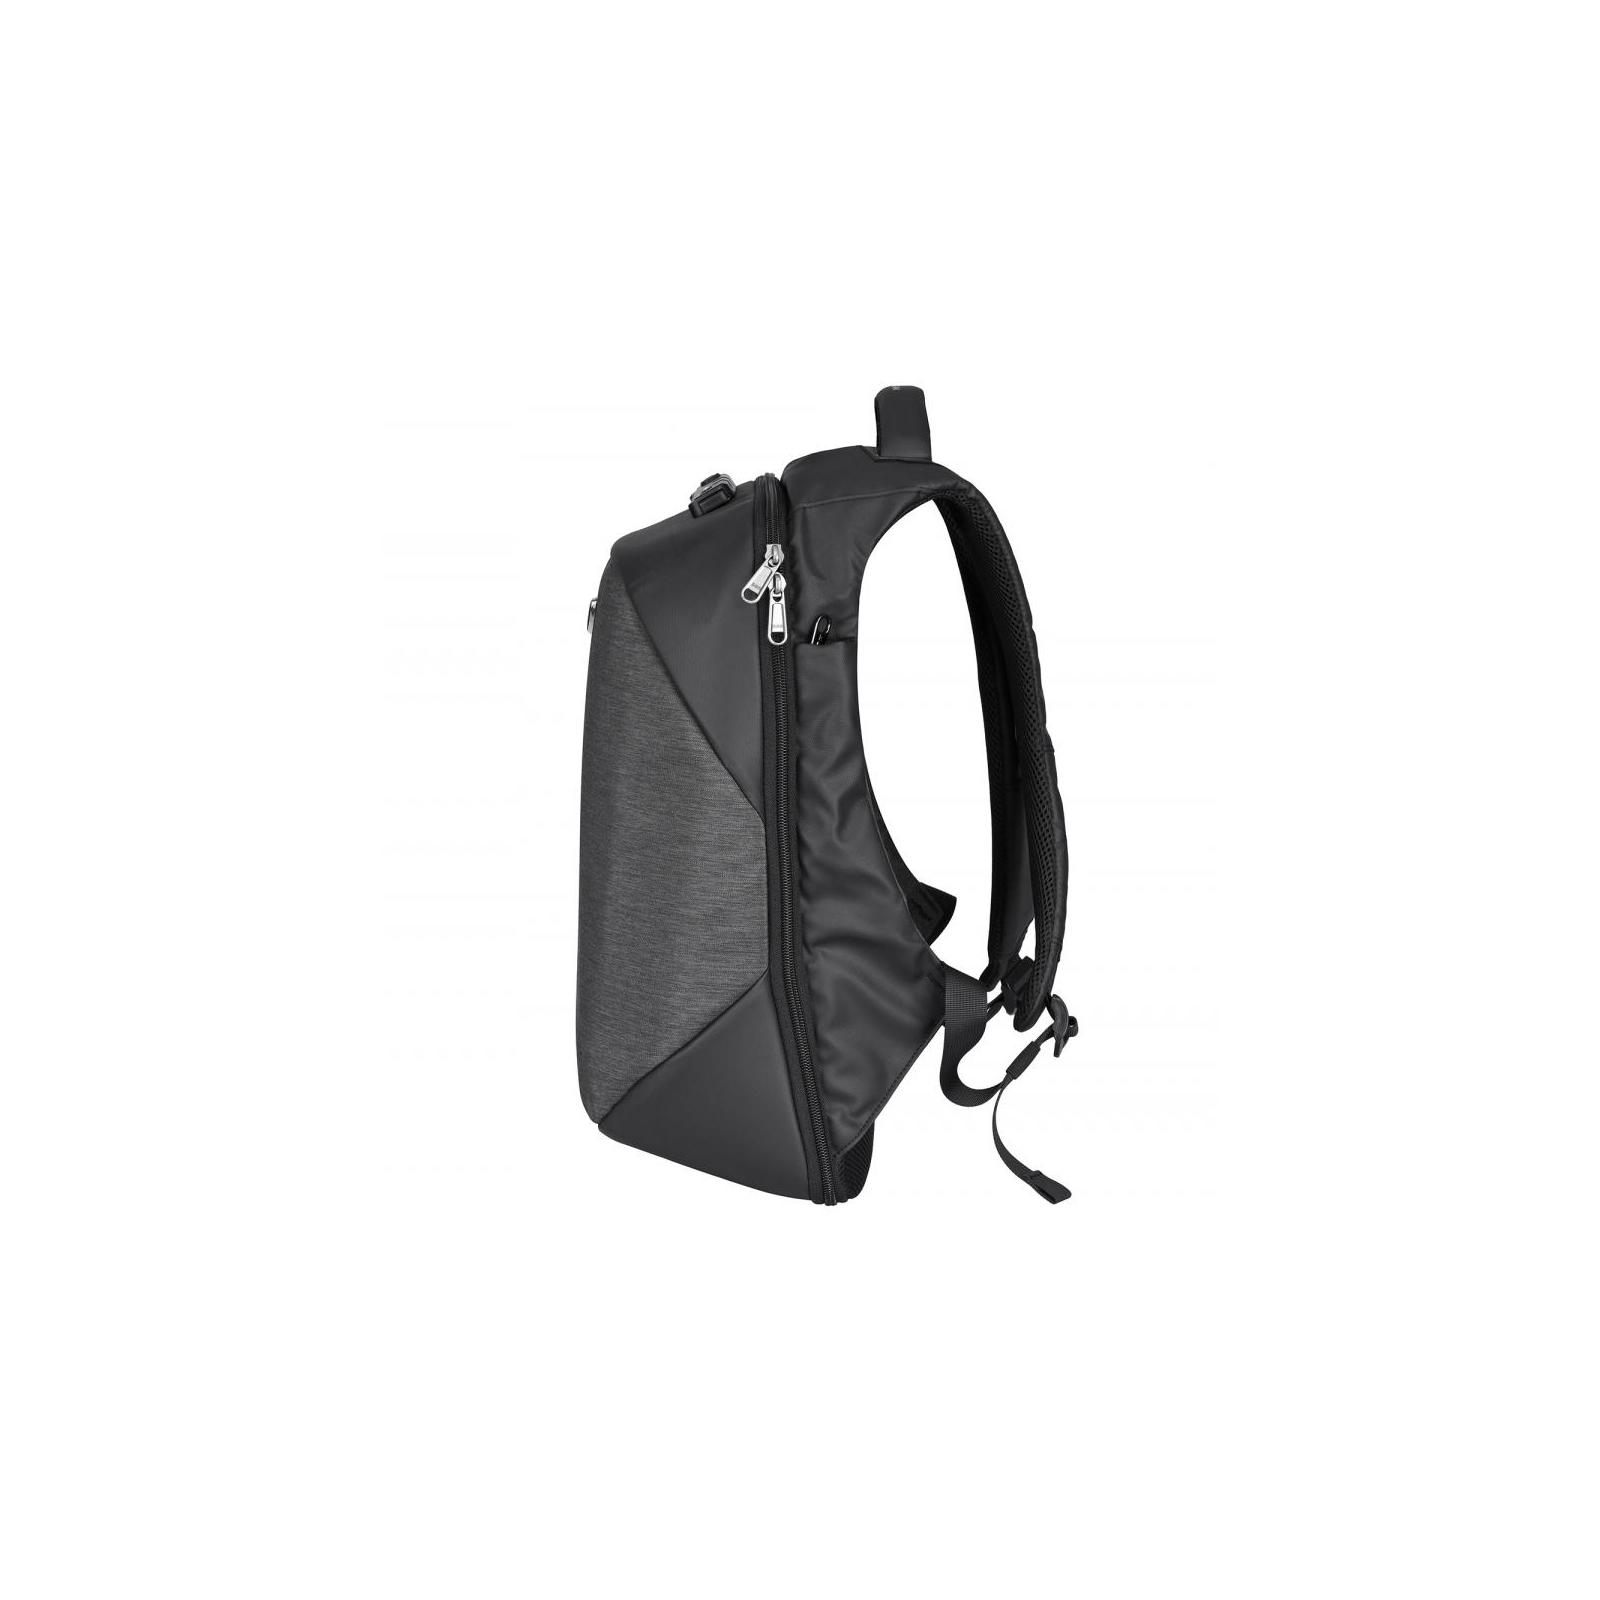 "Рюкзак для ноутбука 2E 16"" BPK63148 Black (2E-BPK63148BK) изображение 2"